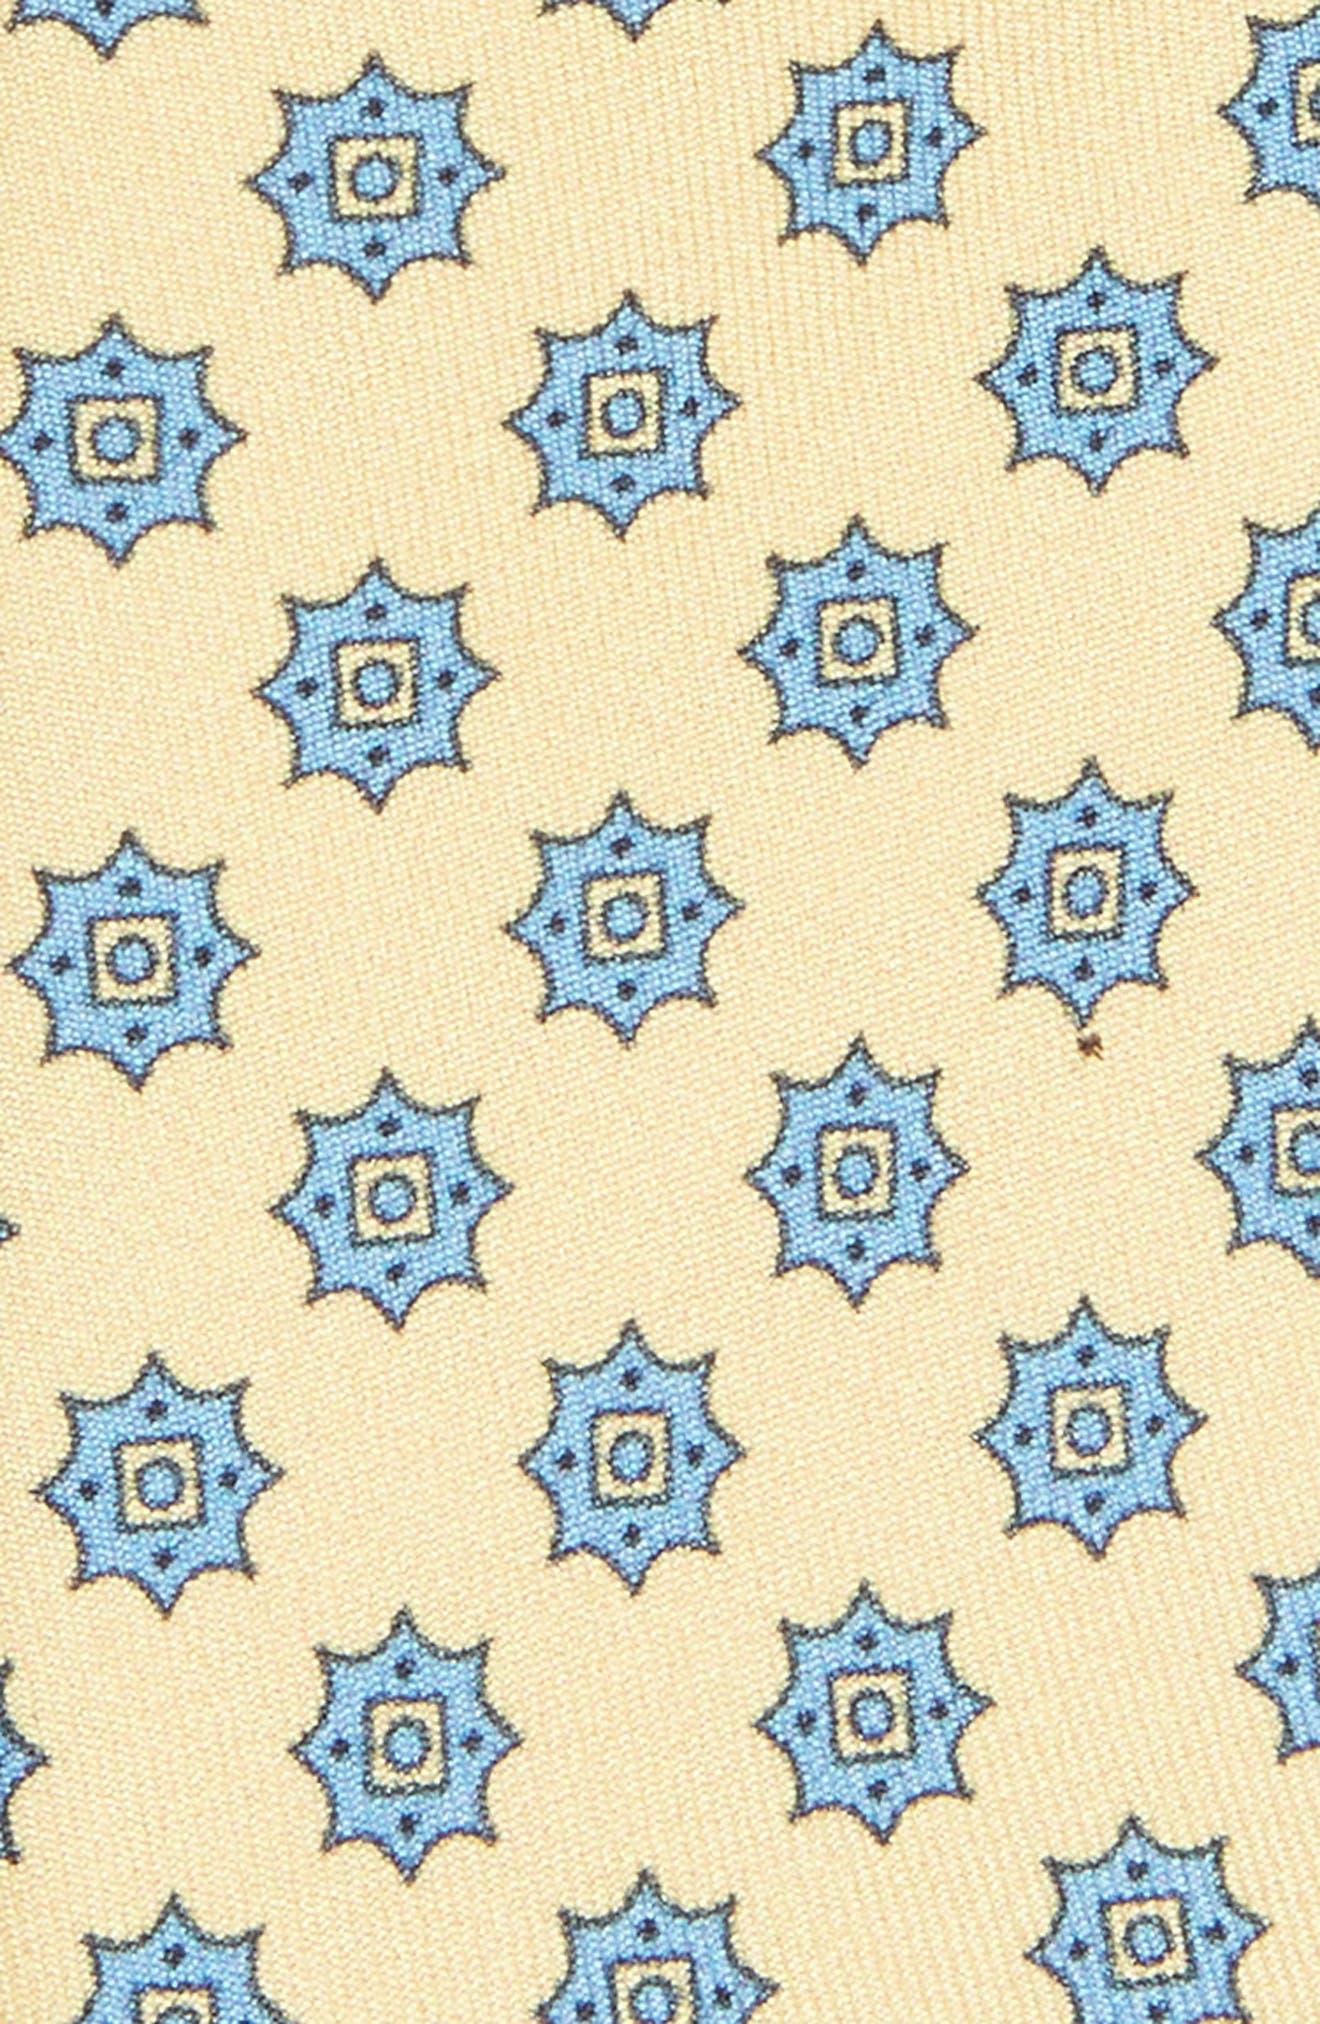 Major Star Silk Tie,                             Alternate thumbnail 2, color,                             Butter